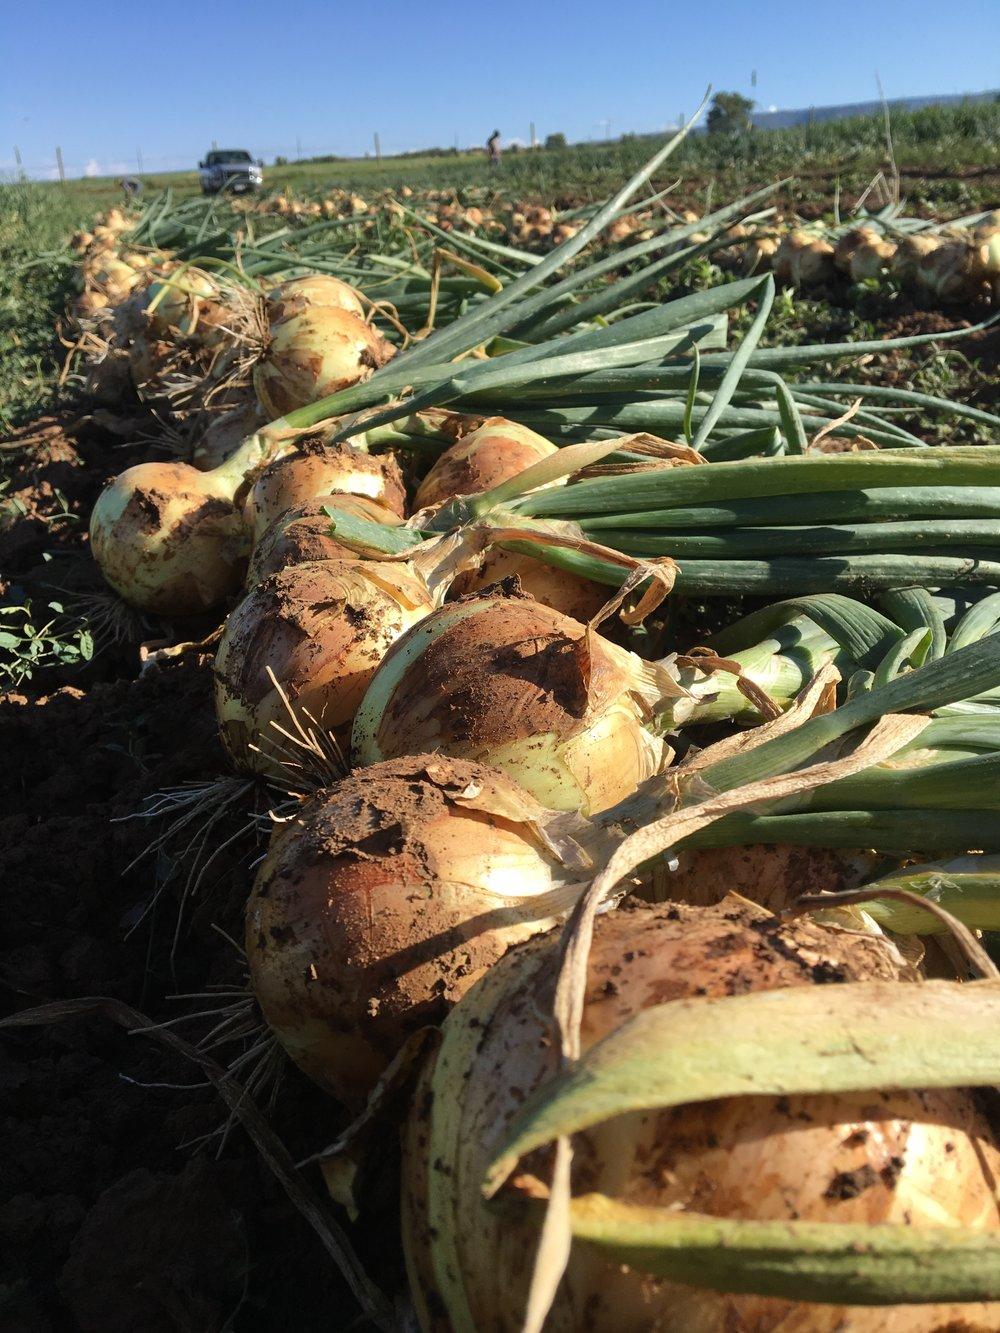 Storage Onion harvest on Thursday morning before the rain